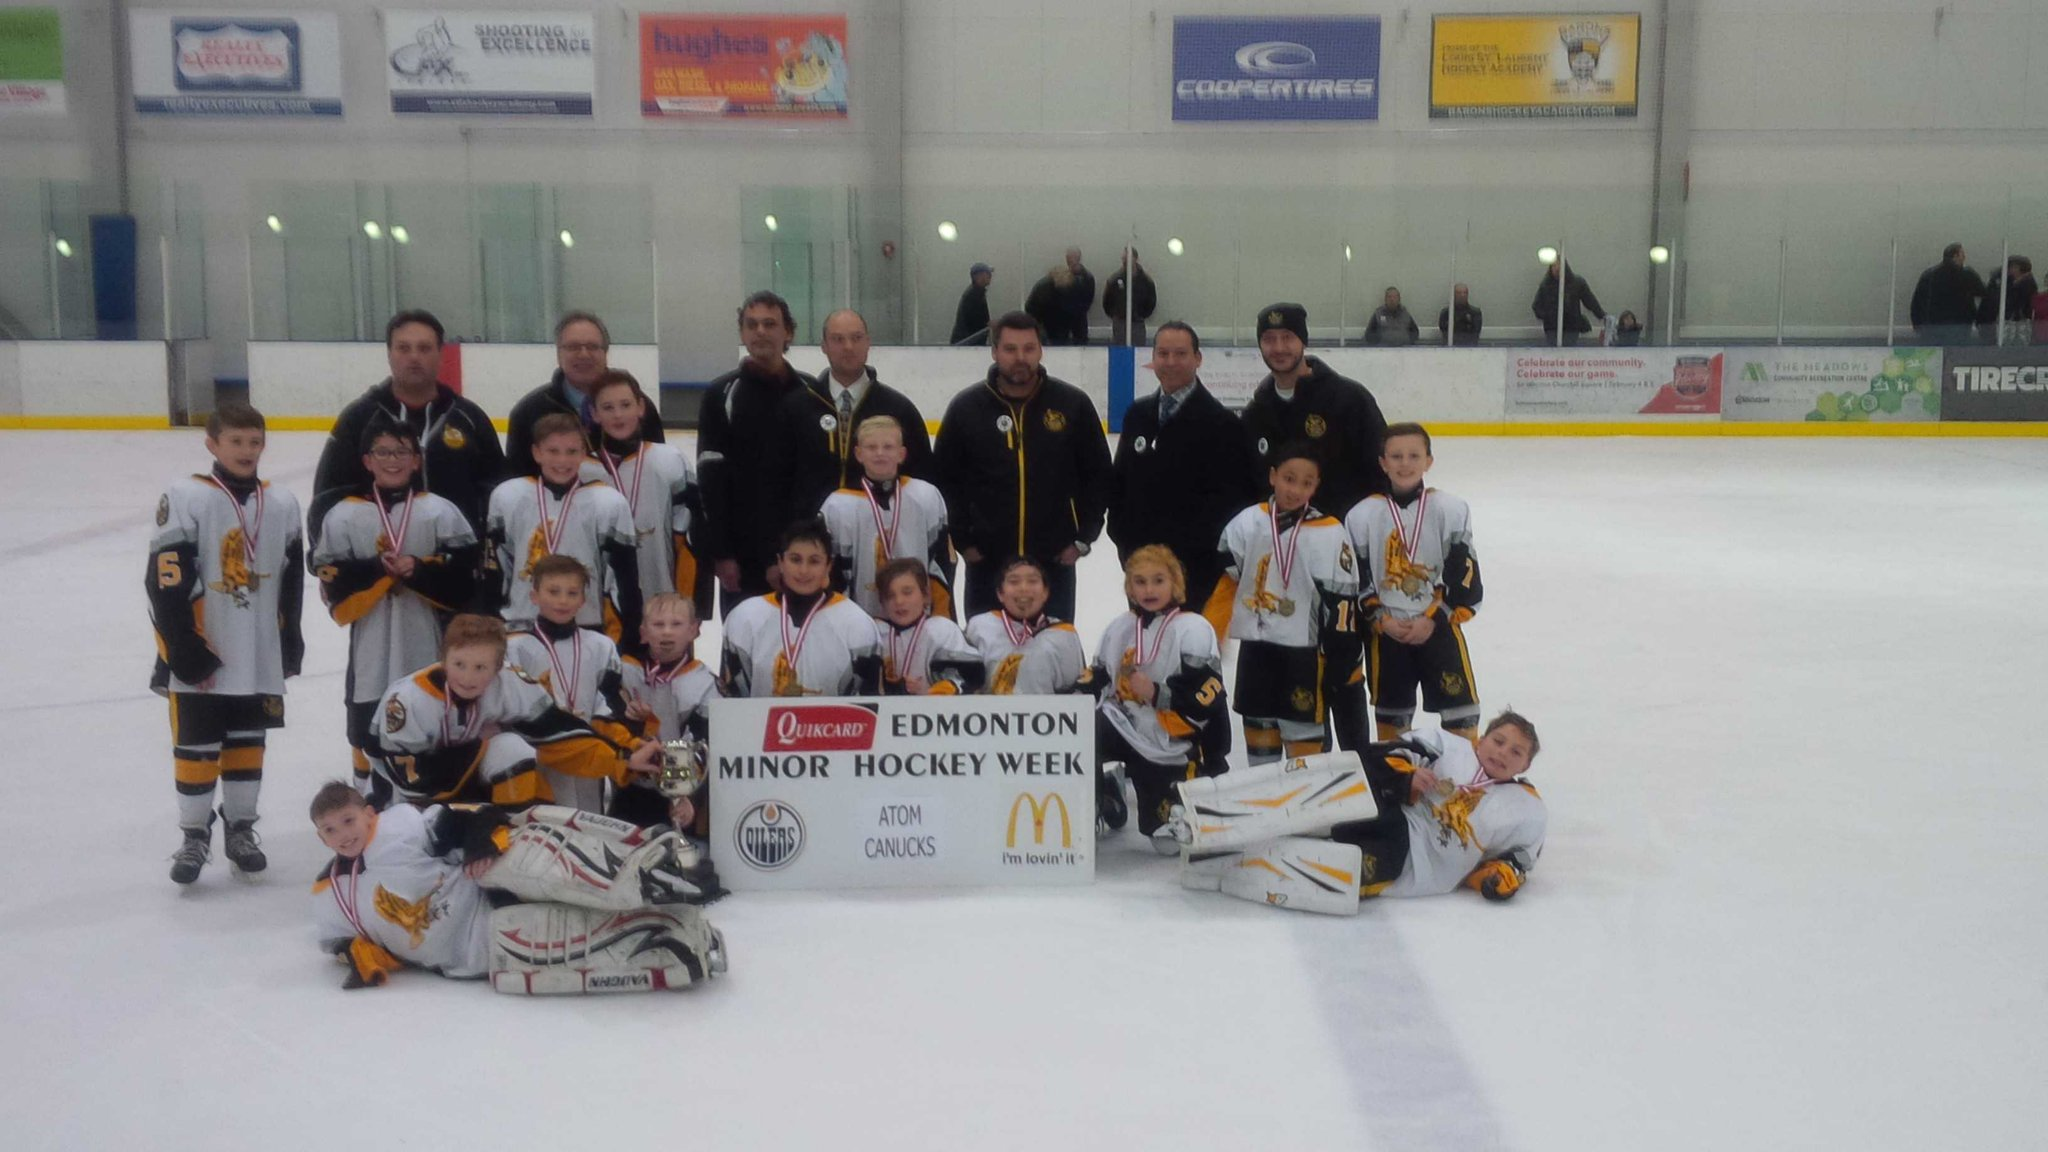 Hawks Athletic Club Edmonton Minor Hockey Website By Ramp